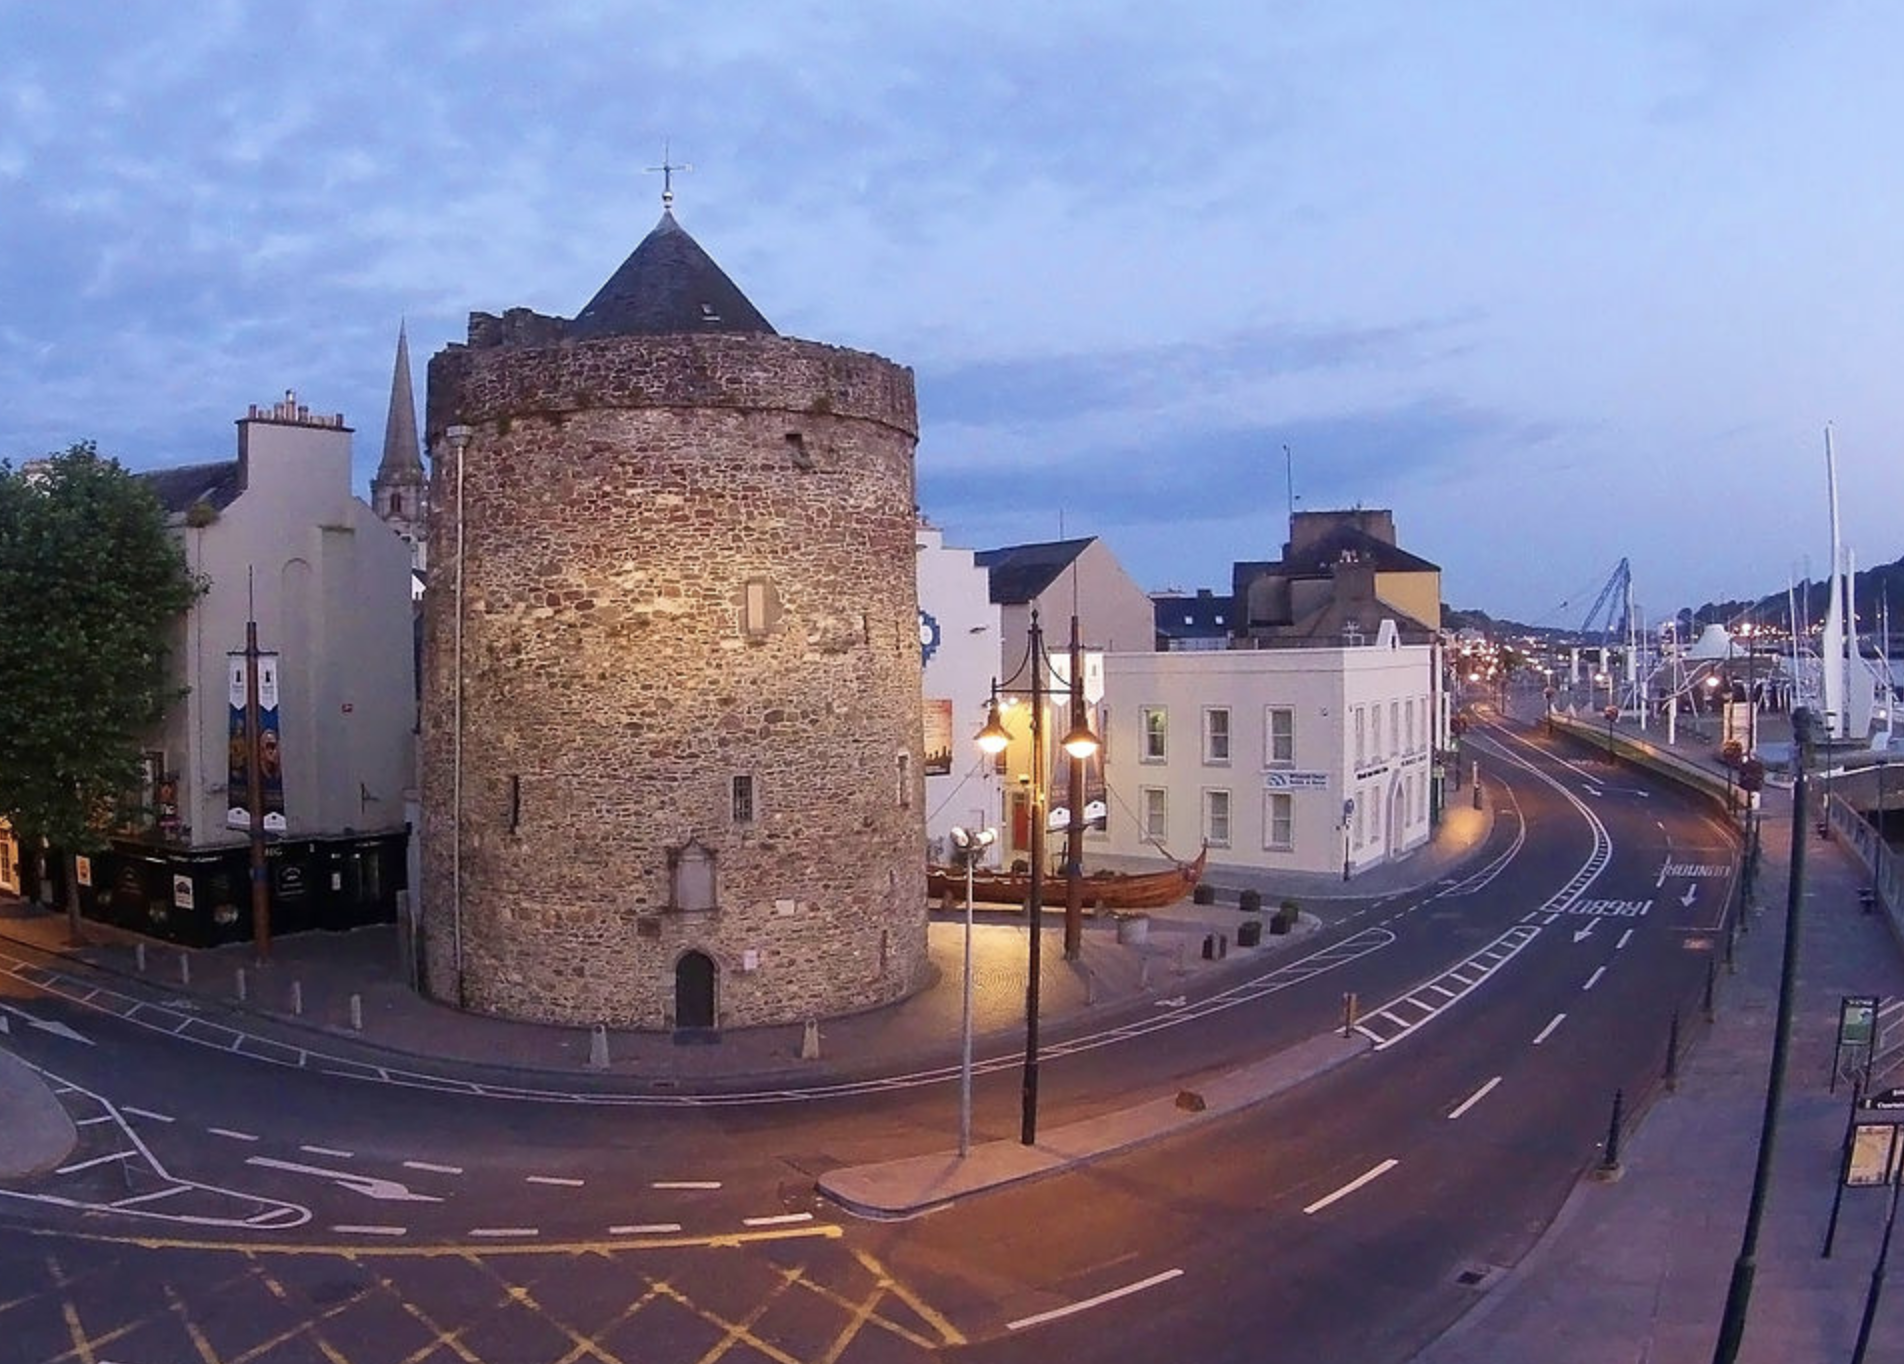 Reginald%27s_Tower%2C_The_Quay%2C_Waterford_City%2C_Ireland.JPG/1280px-Reginald%27s_Tower%2C_The_Quay%2C_Waterford_City%2C_Ireland